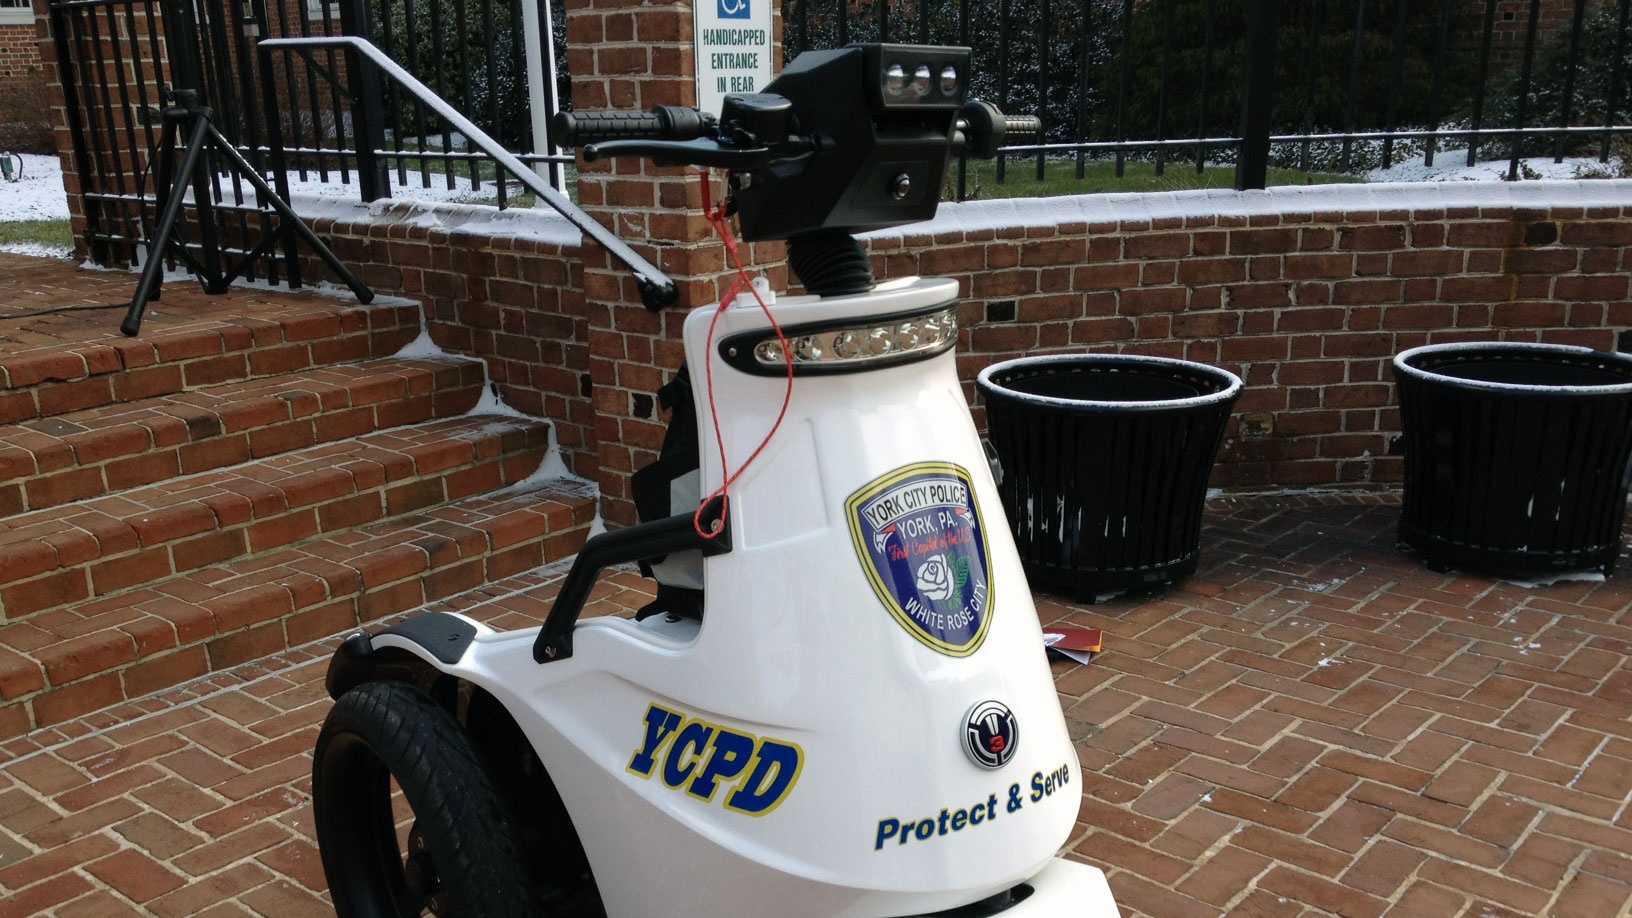 1.24 York police vehicle